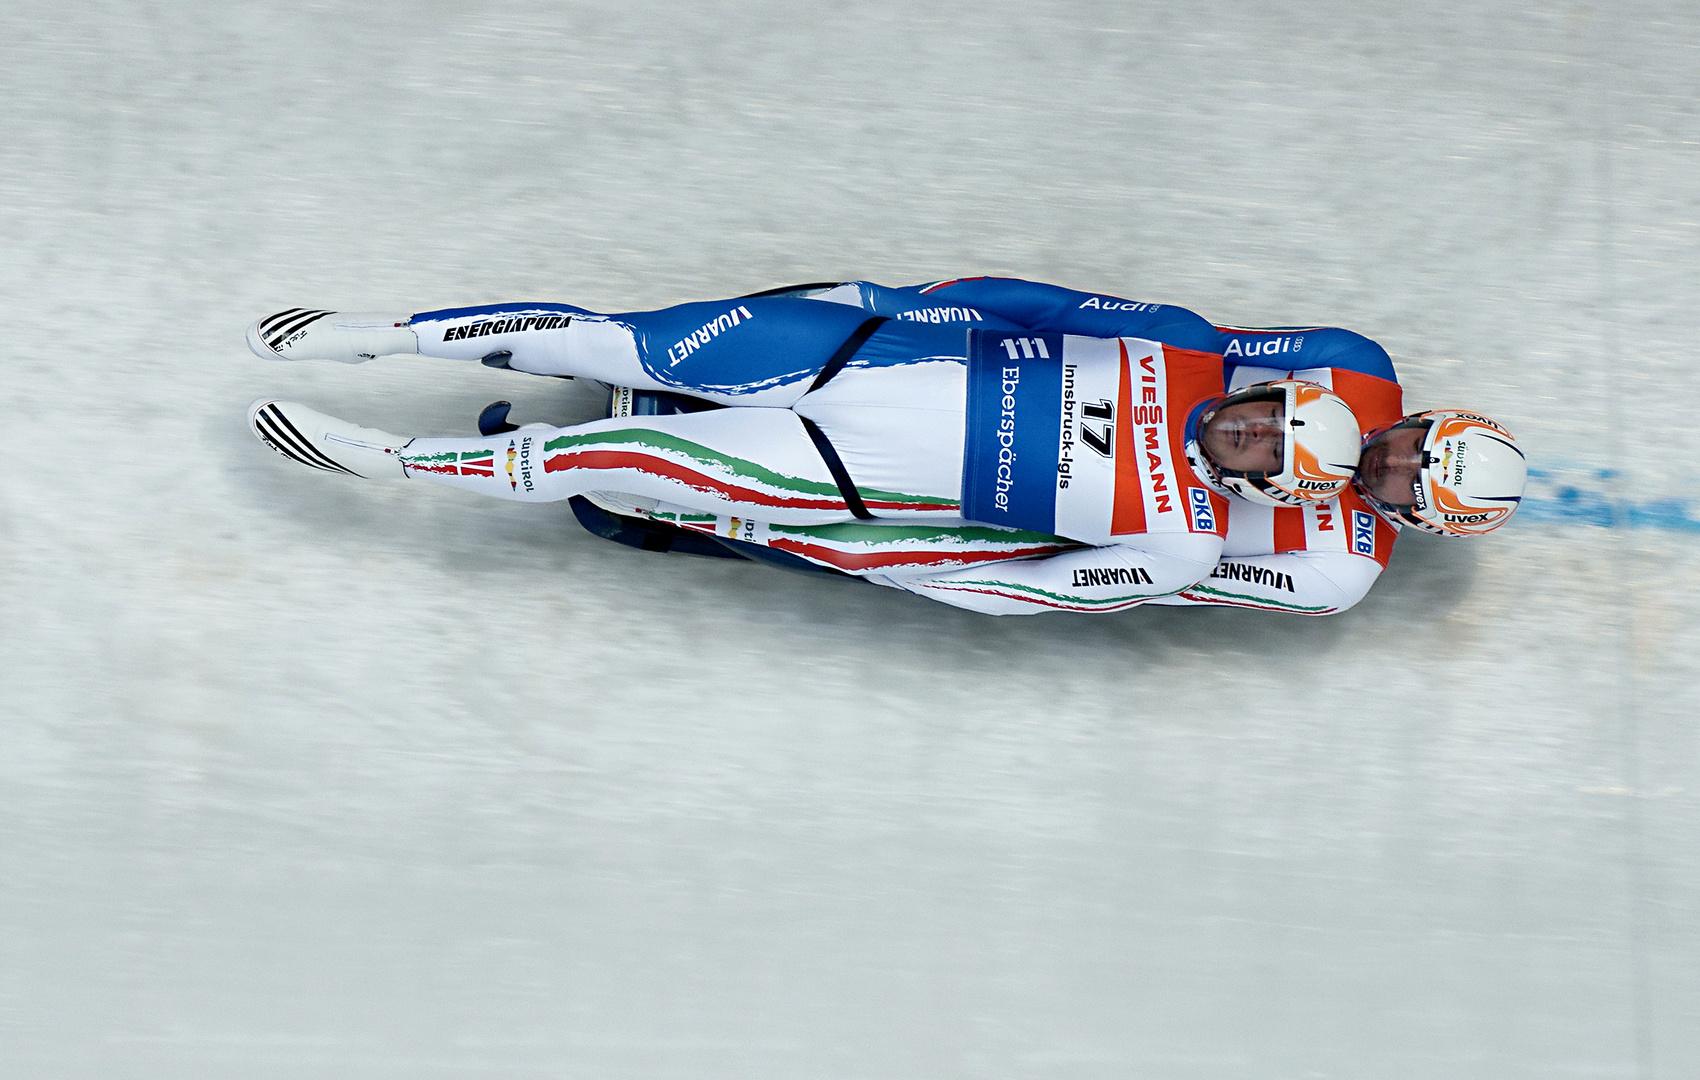 Rodelweltcup Innsbruck-Igls / 3